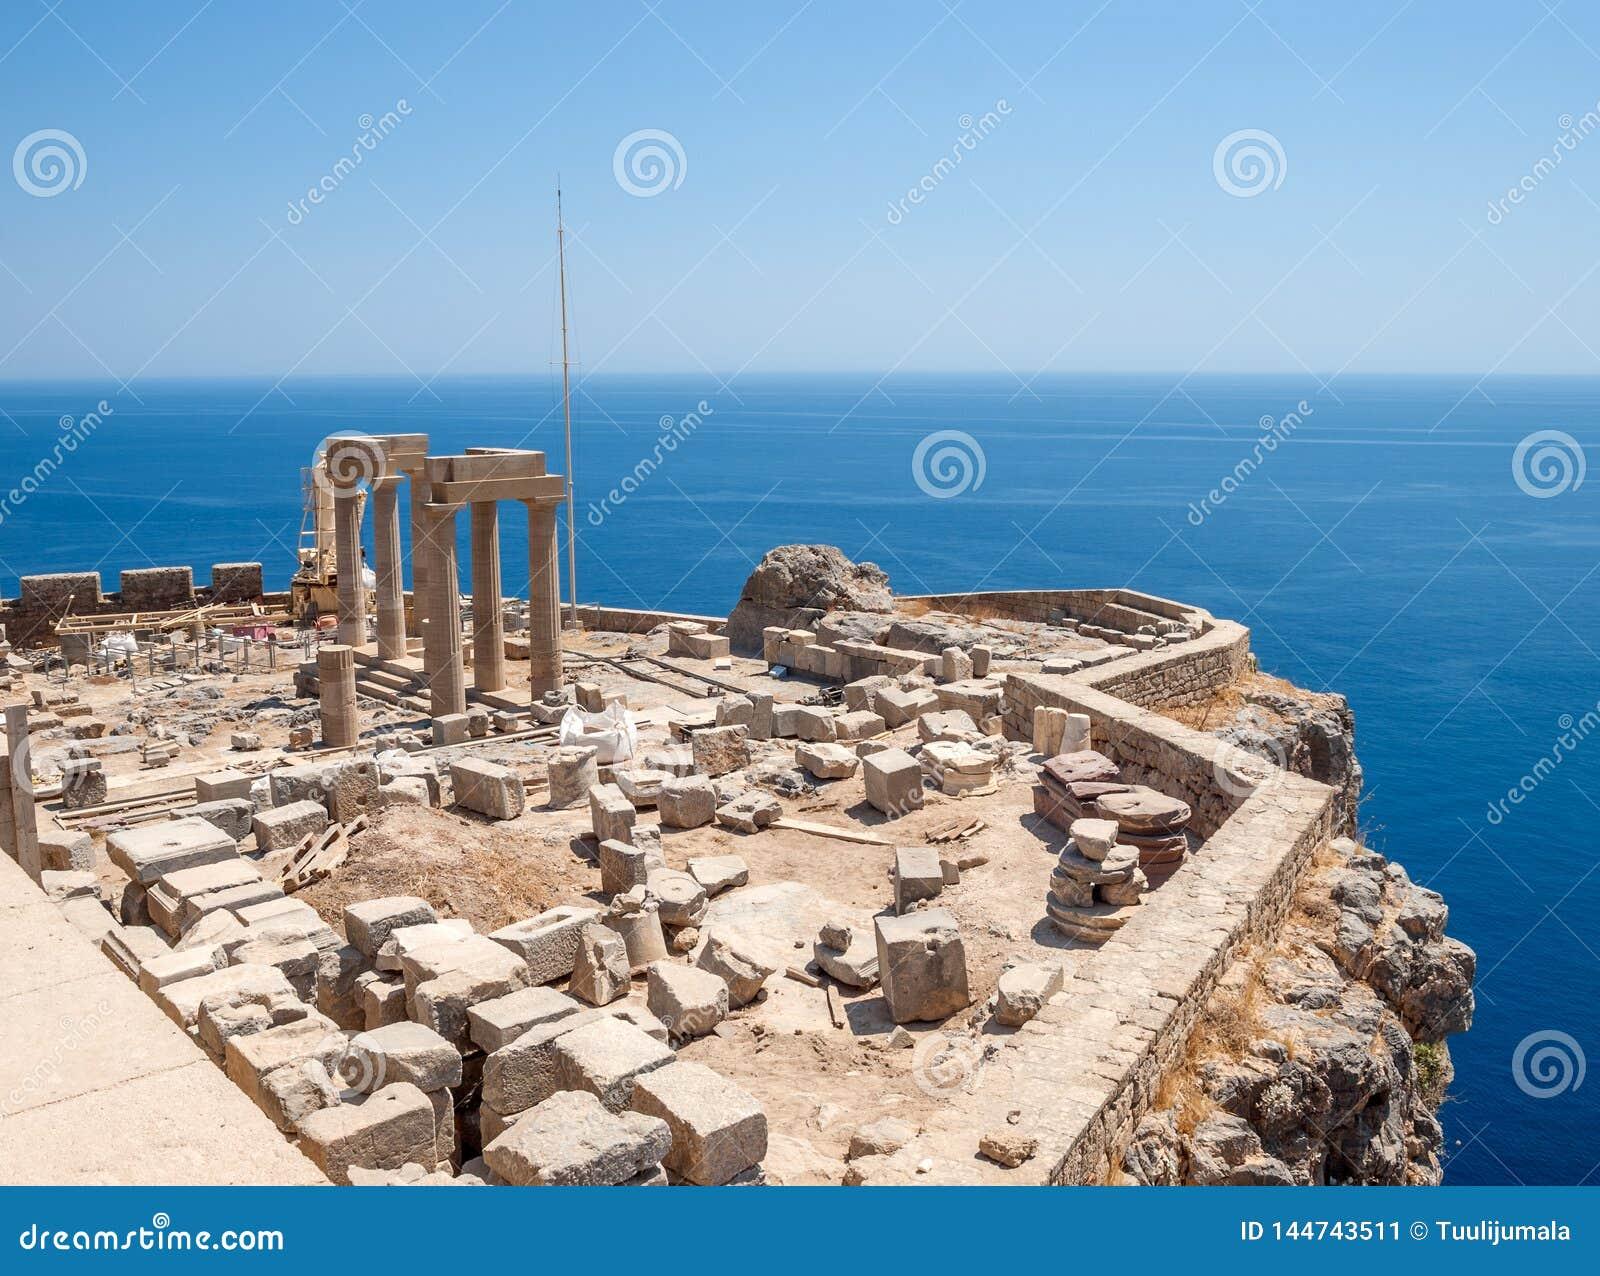 Lindos Acropolis Ruins on the Sea Cliff